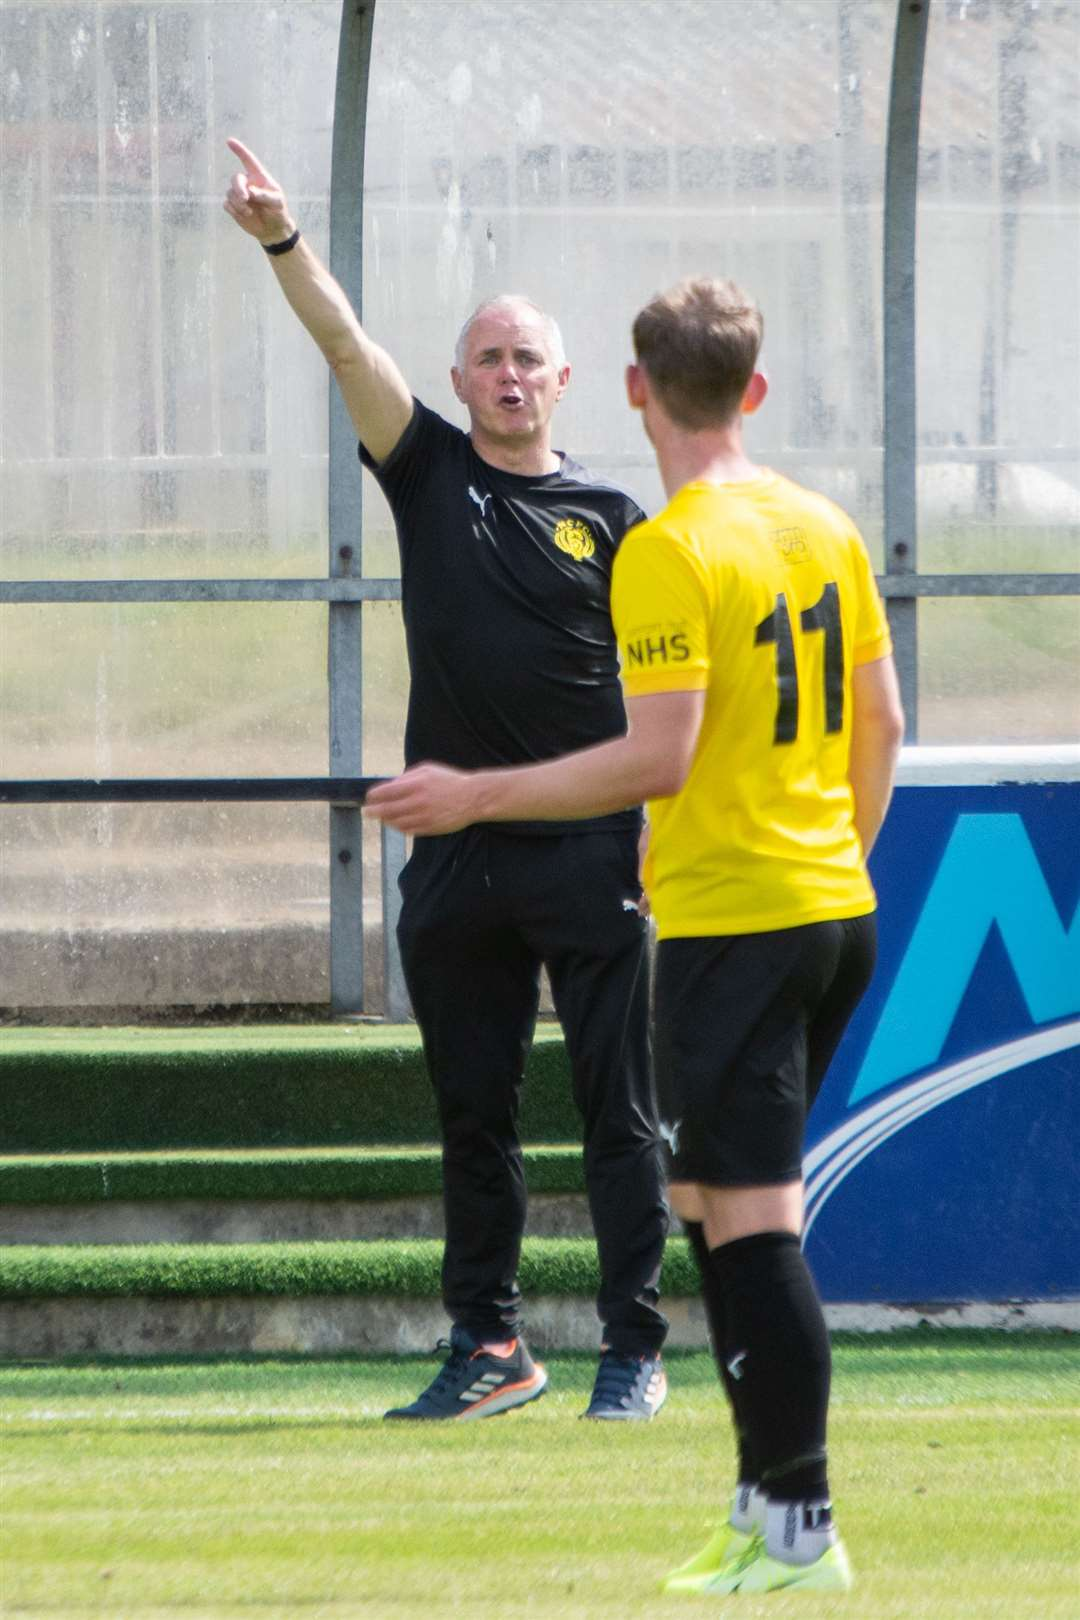 Nairn County manager Ronnie Sharp gives the orders ... Elgin City FC (3) vs Nairn County FC (0) - Preseason Friendly - Borough Briggs, Elgin 07/17/2021 ... Photo: Daniel Forsyth ..